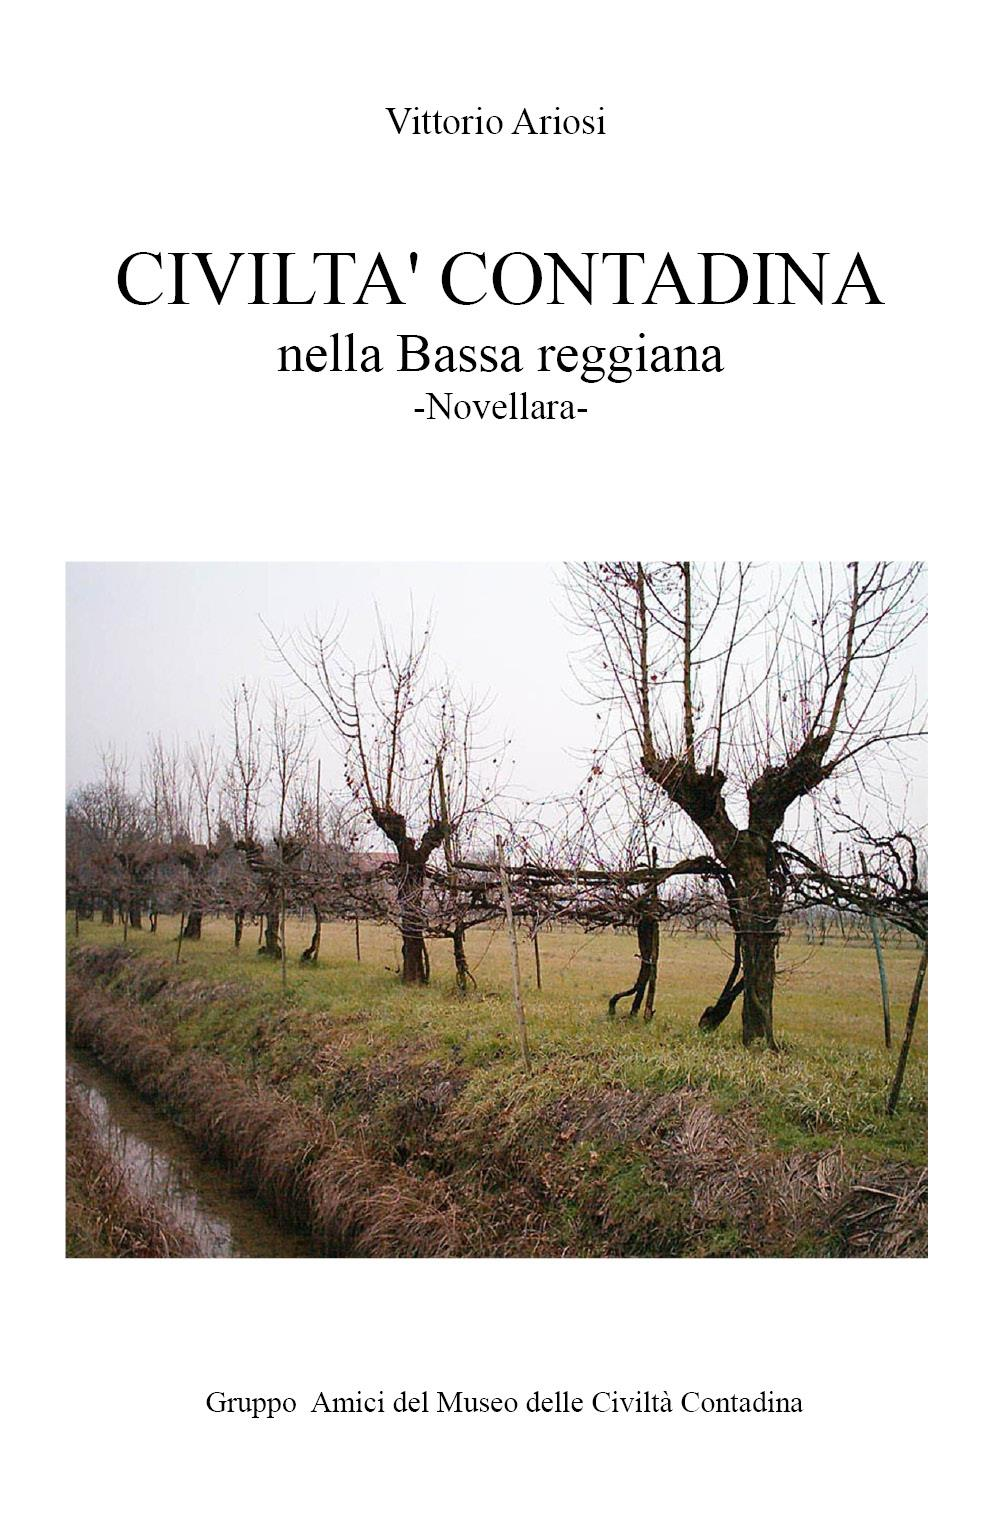 Civiltà contadina nella Bassa reggiana - Novellara